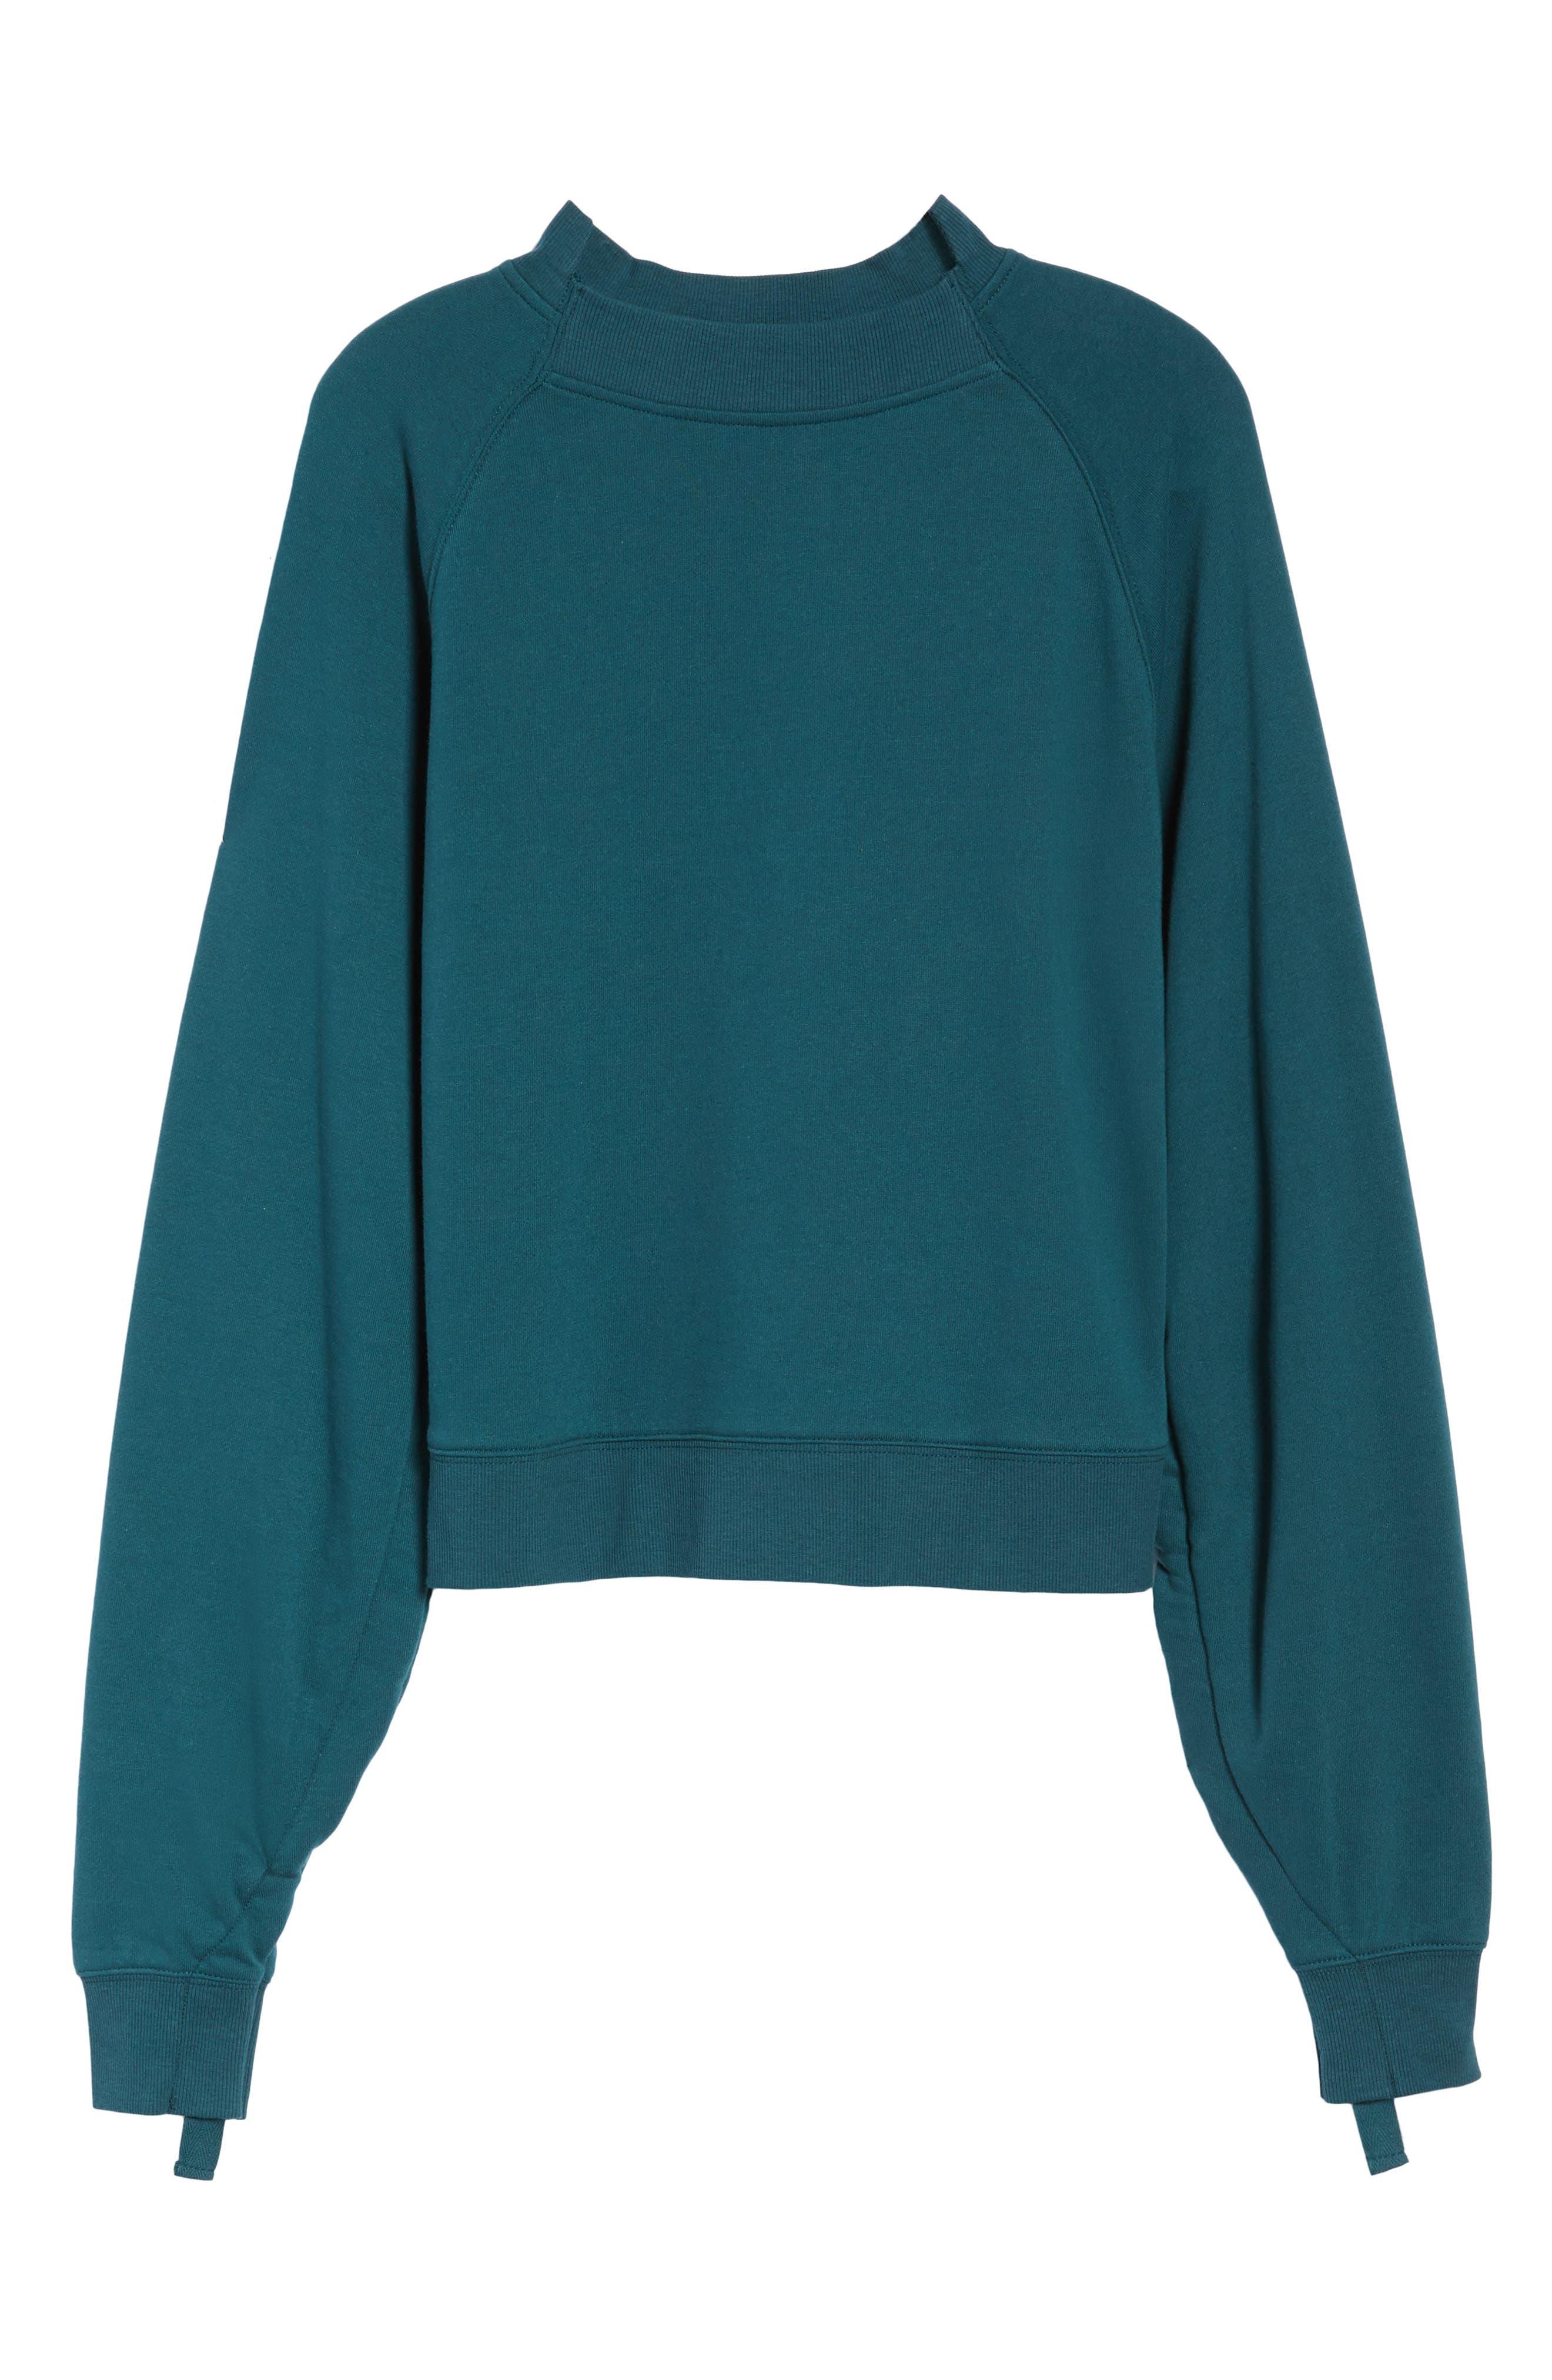 Cinched Sleeve Sweatshirt,                             Alternate thumbnail 6, color,                             Teal